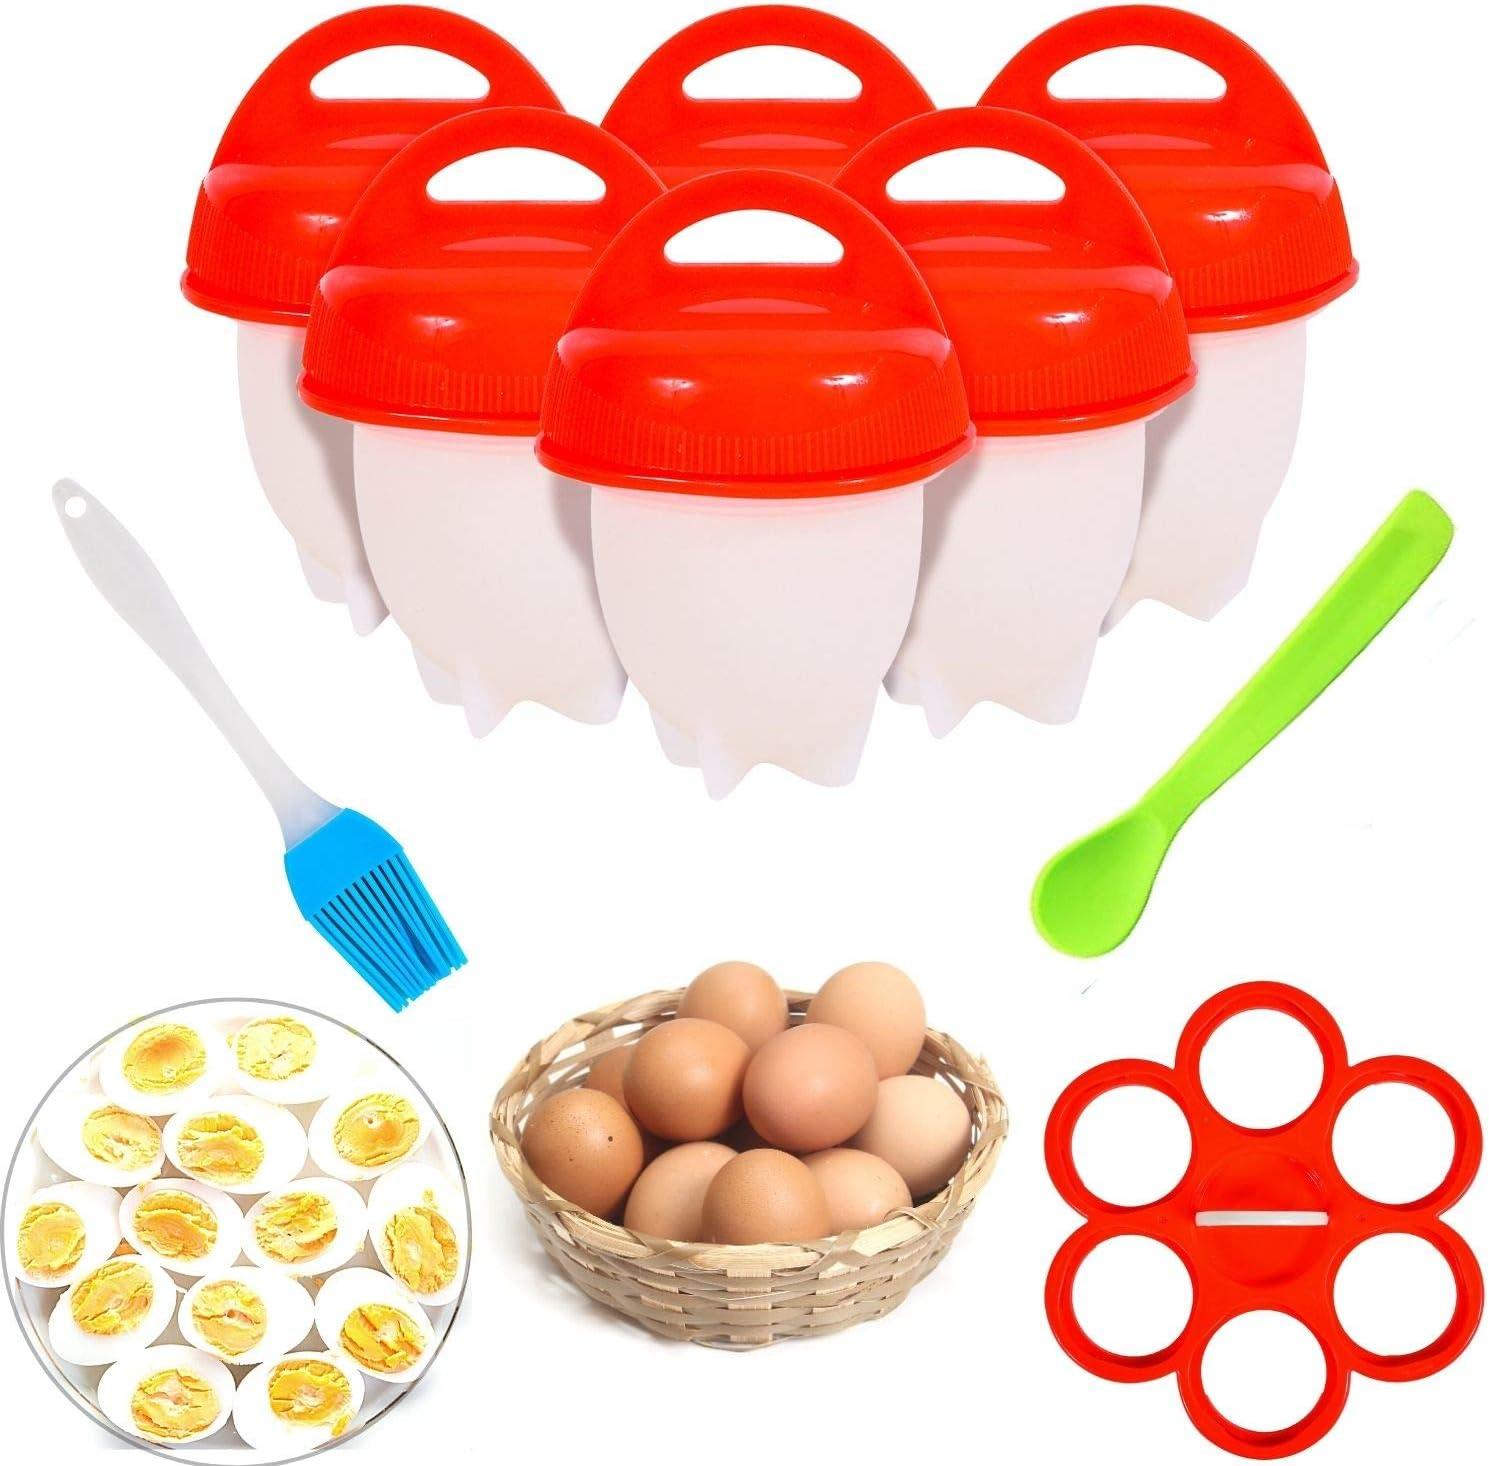 Details about  /New Fig /& Olive Poachers Silicone Egg Boil Hard Boil Kitchen Gadget Utensil